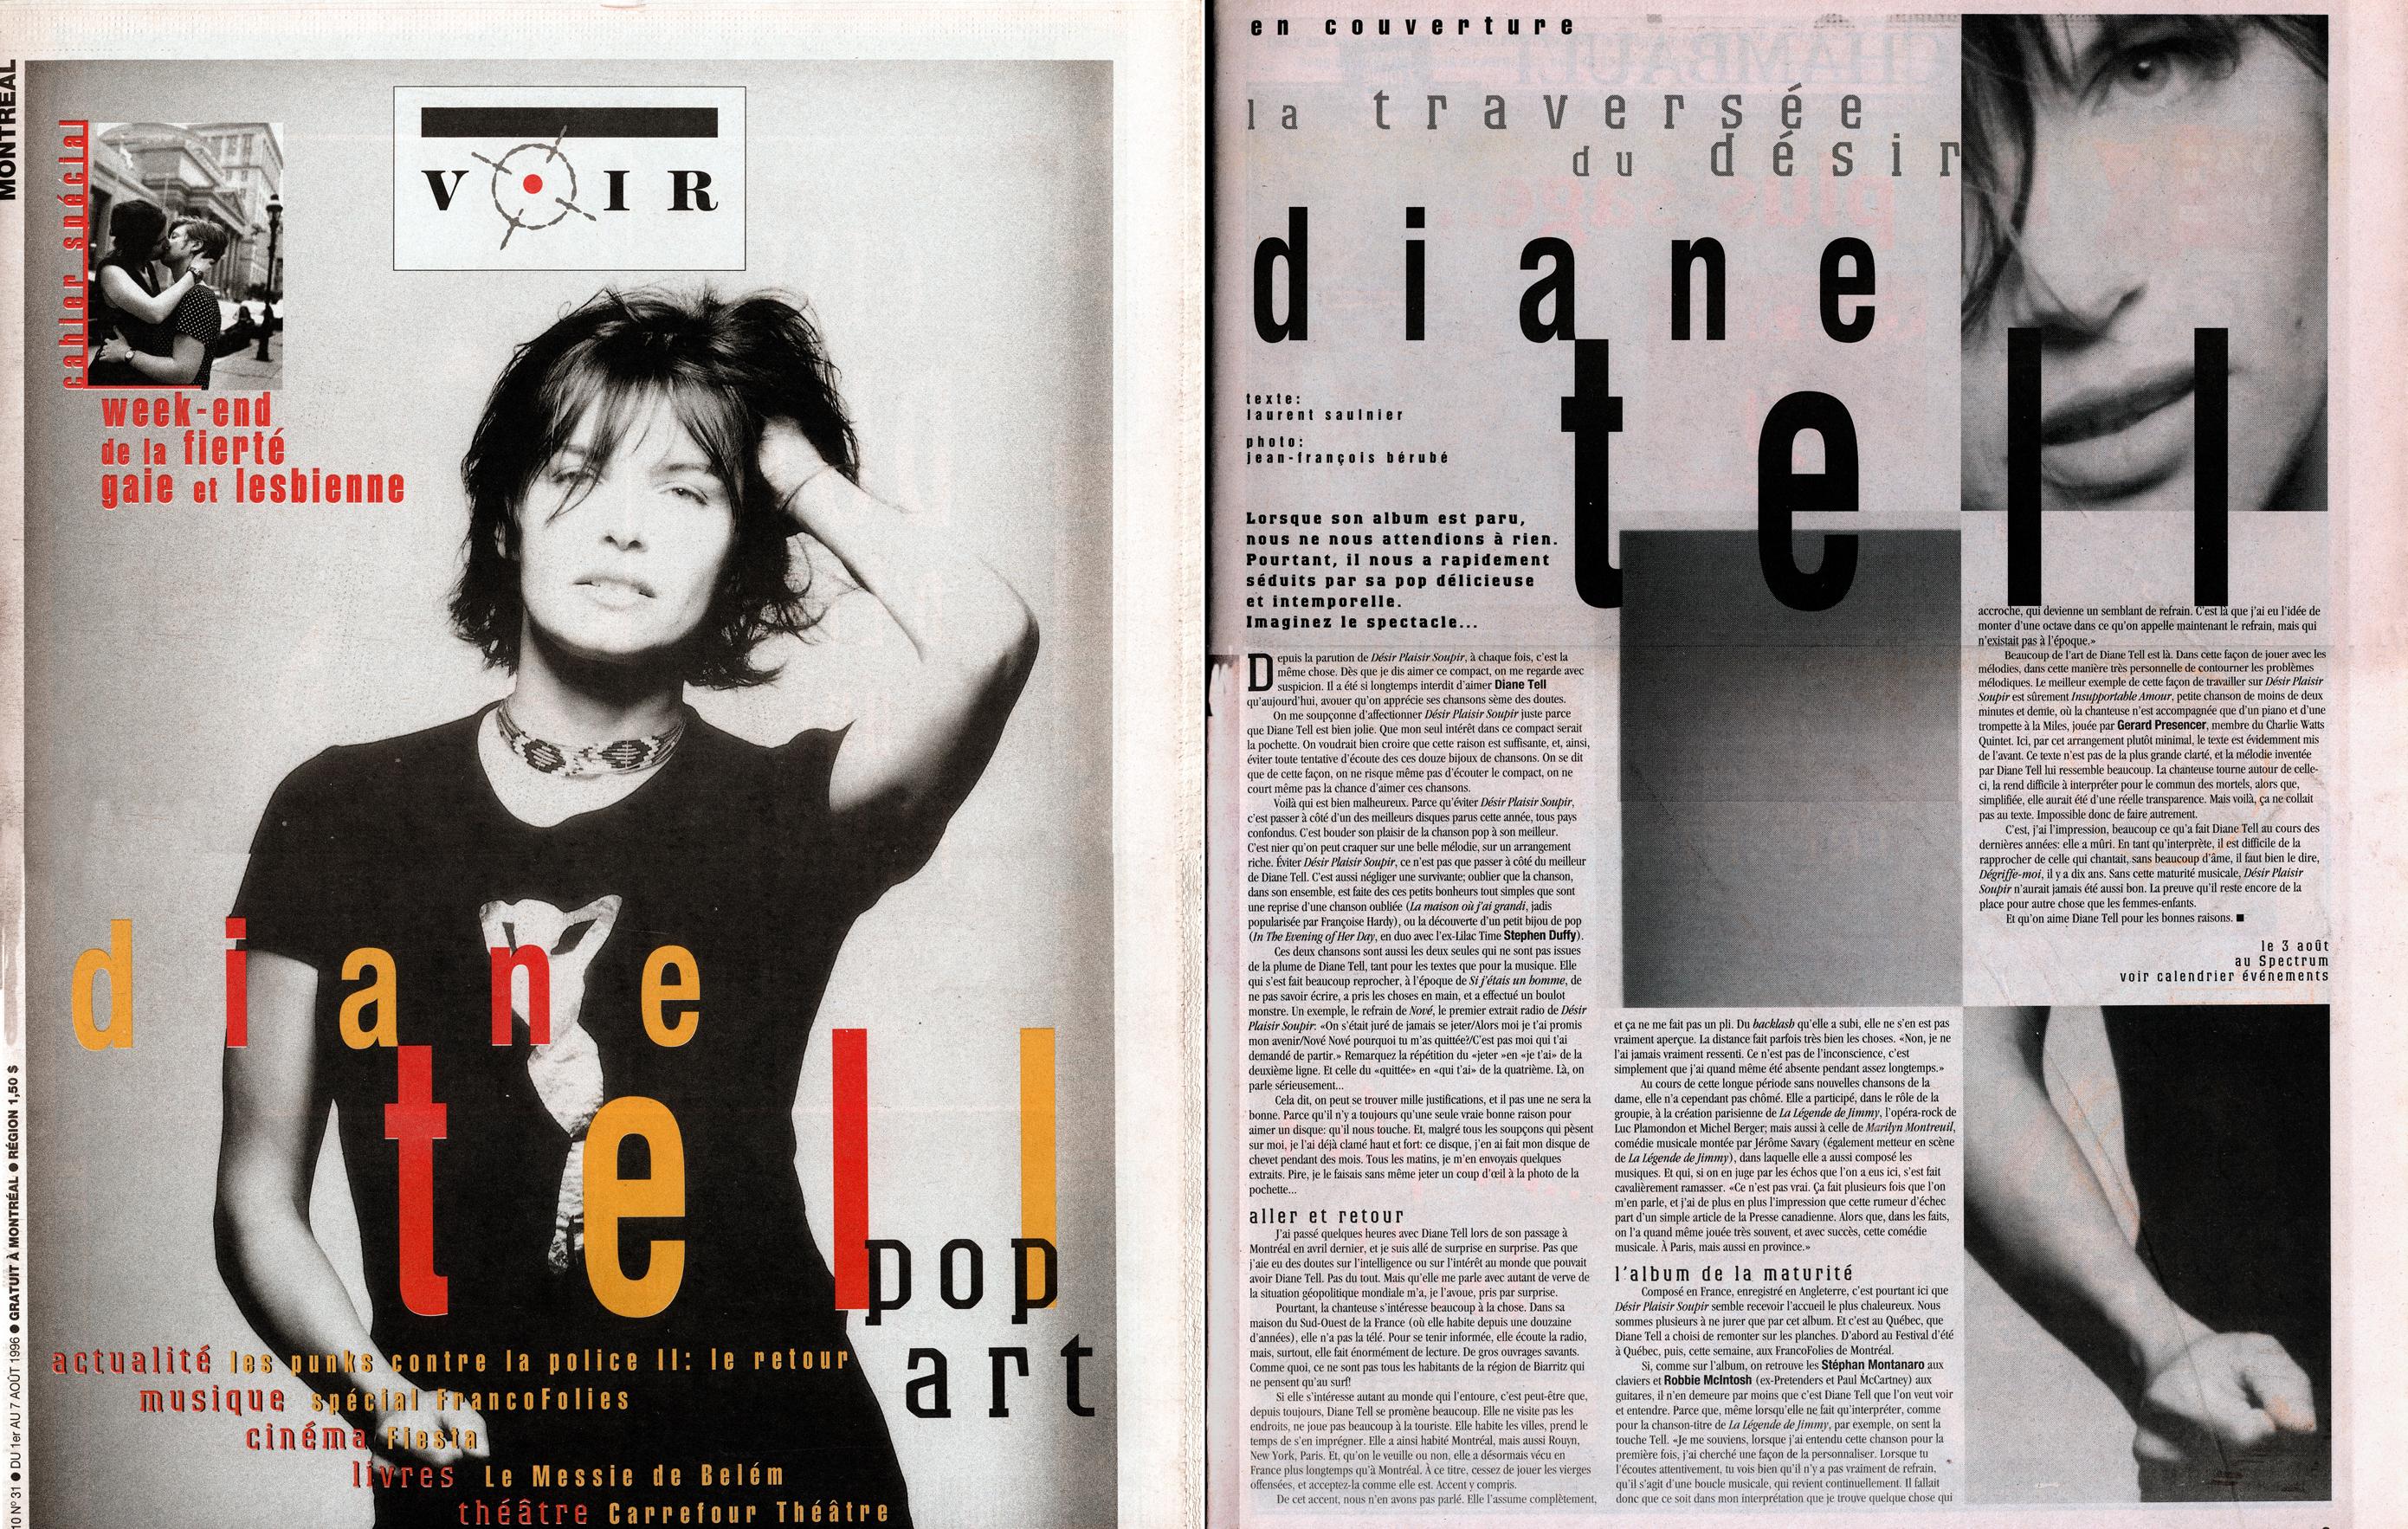 Voir – Désir Plaisir Soupir 1996